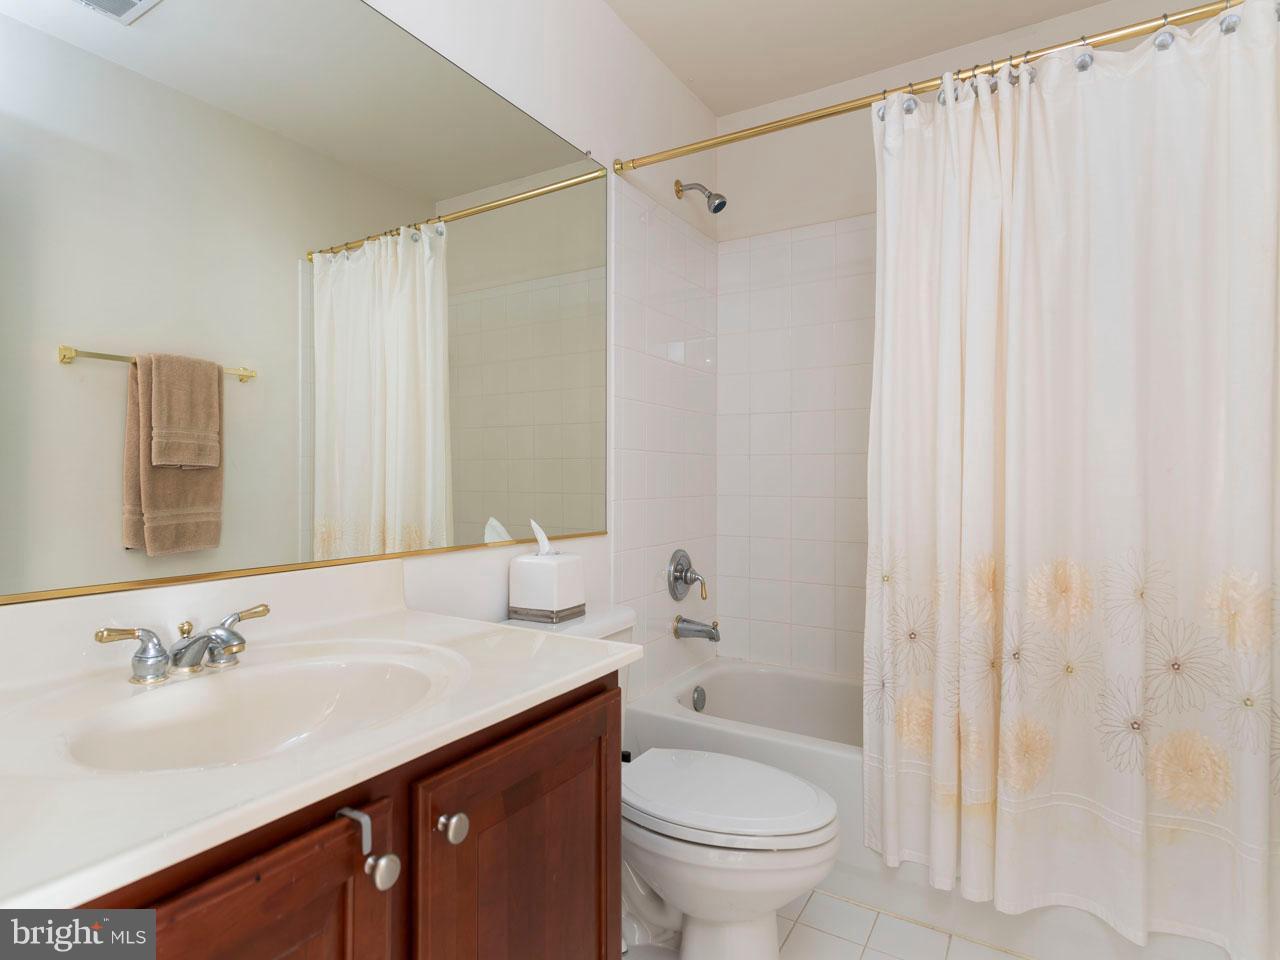 VAFX426100-301143652404-2021-09-05-14-39-04  |   | Chantilly Delaware Real Estate For Sale | MLS# Vafx426100  - Best of Northern Virginia